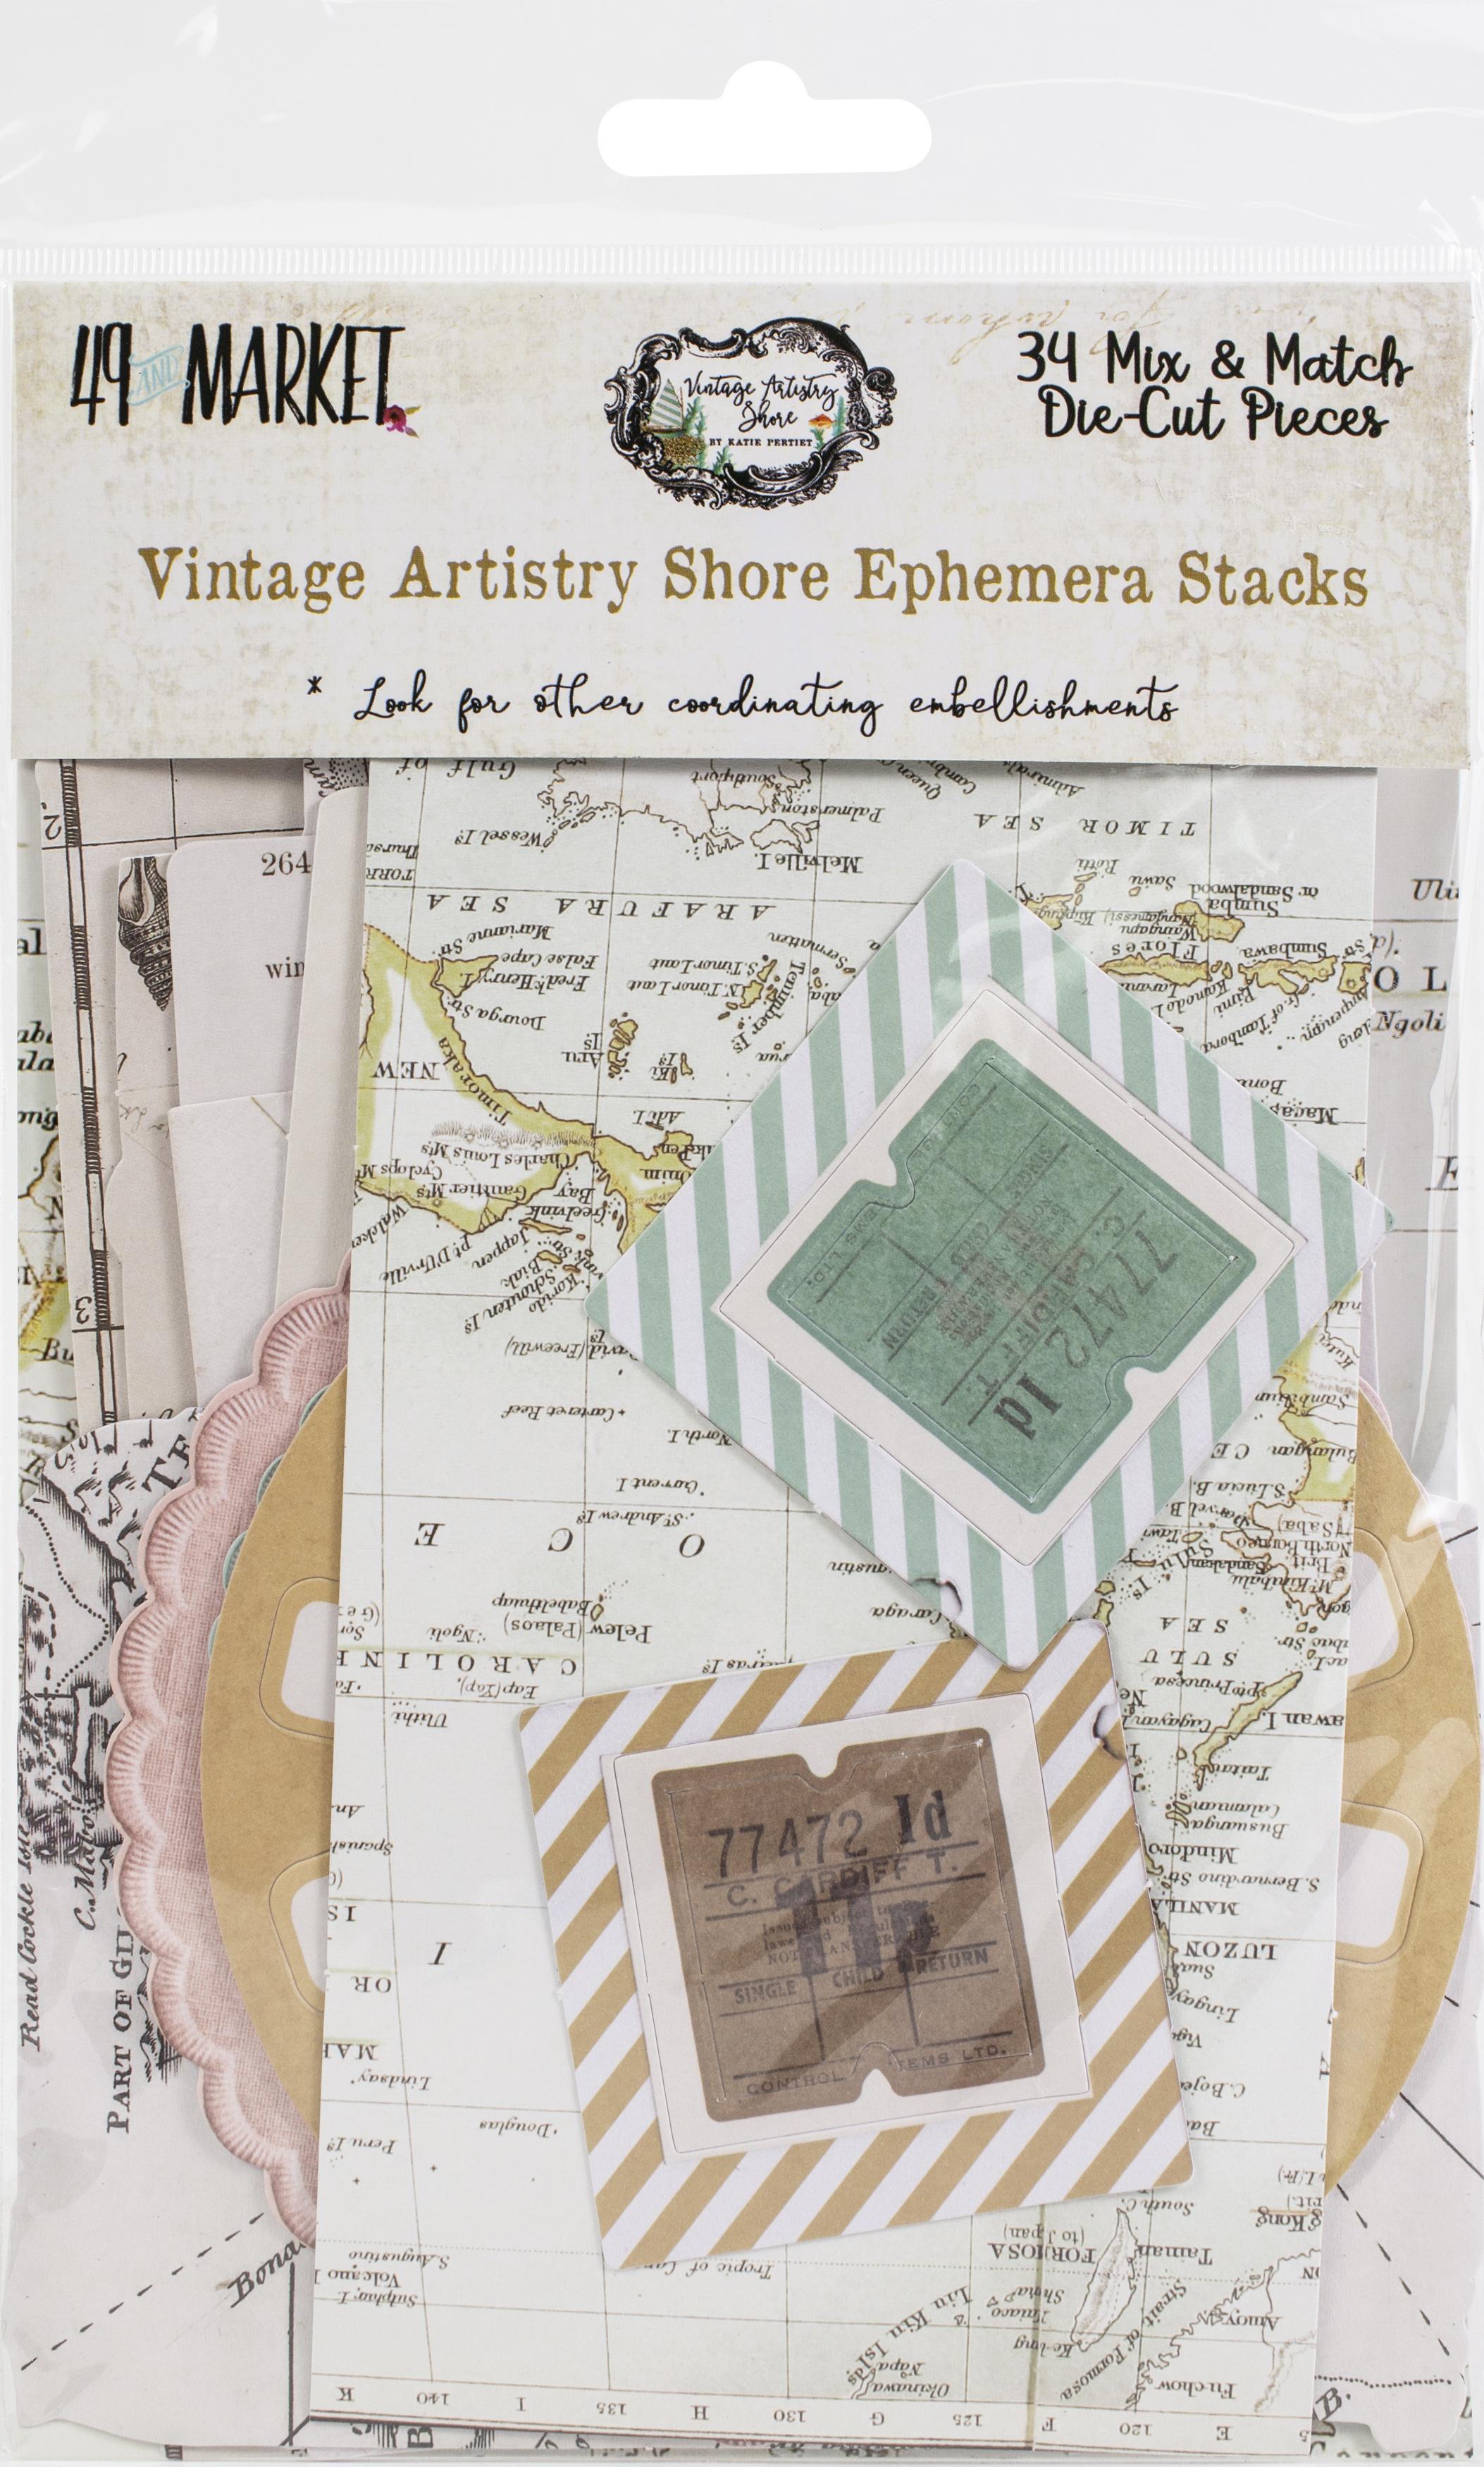 Vintage Artistry Shore Collage Stack-